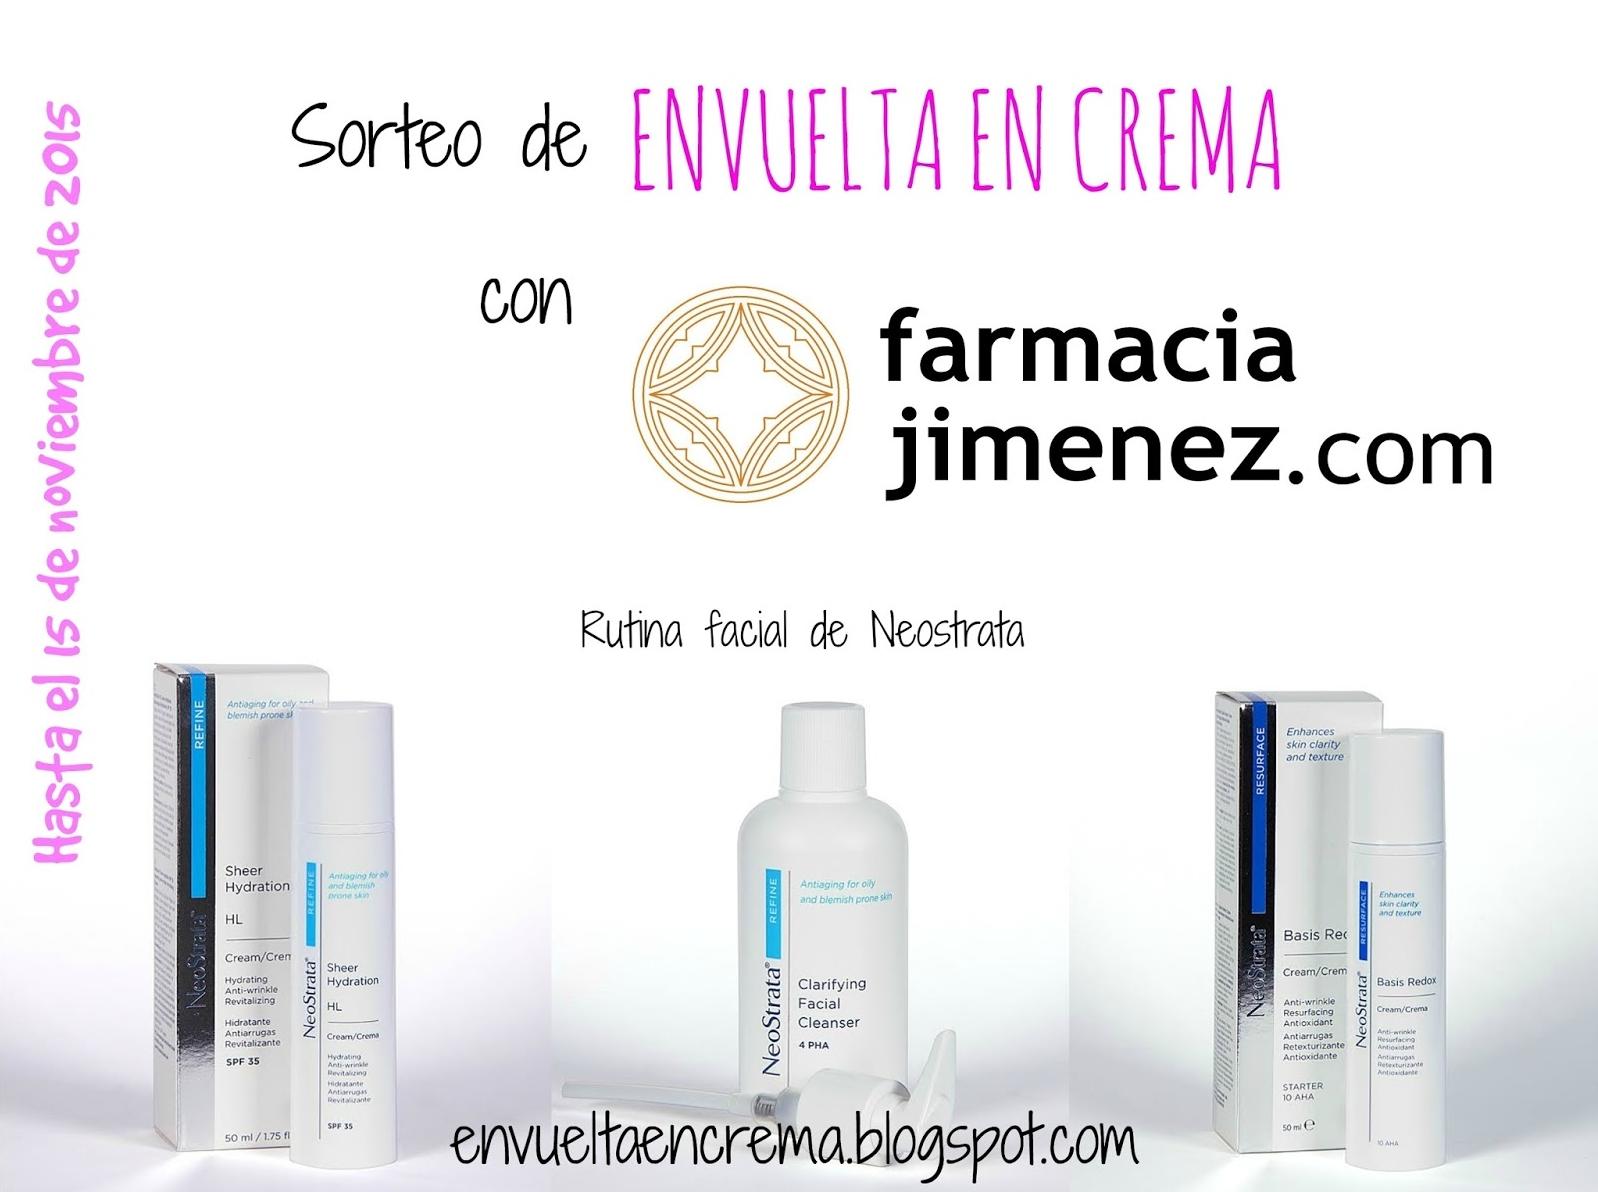 http://envueltaencrema.blogspot.com.es/2015/10/iii-aniversario-de-envuelta-en-crema_14.html